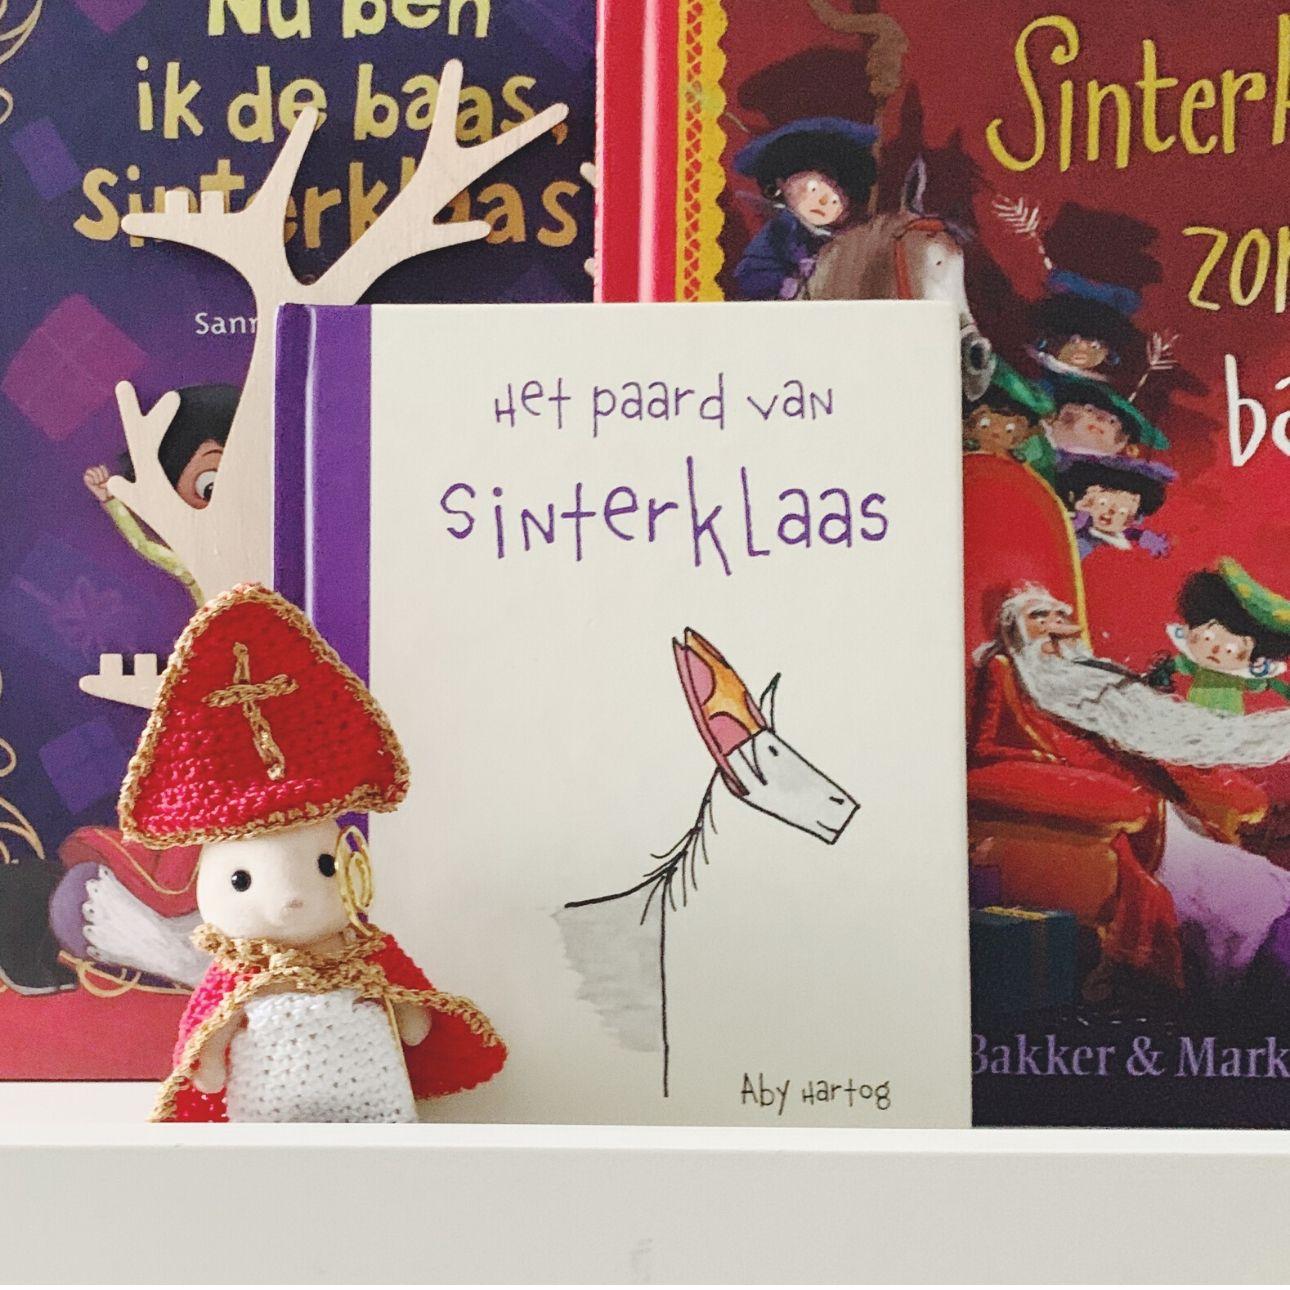 Sinterklaas kinderboeken roetveegpieten (2)